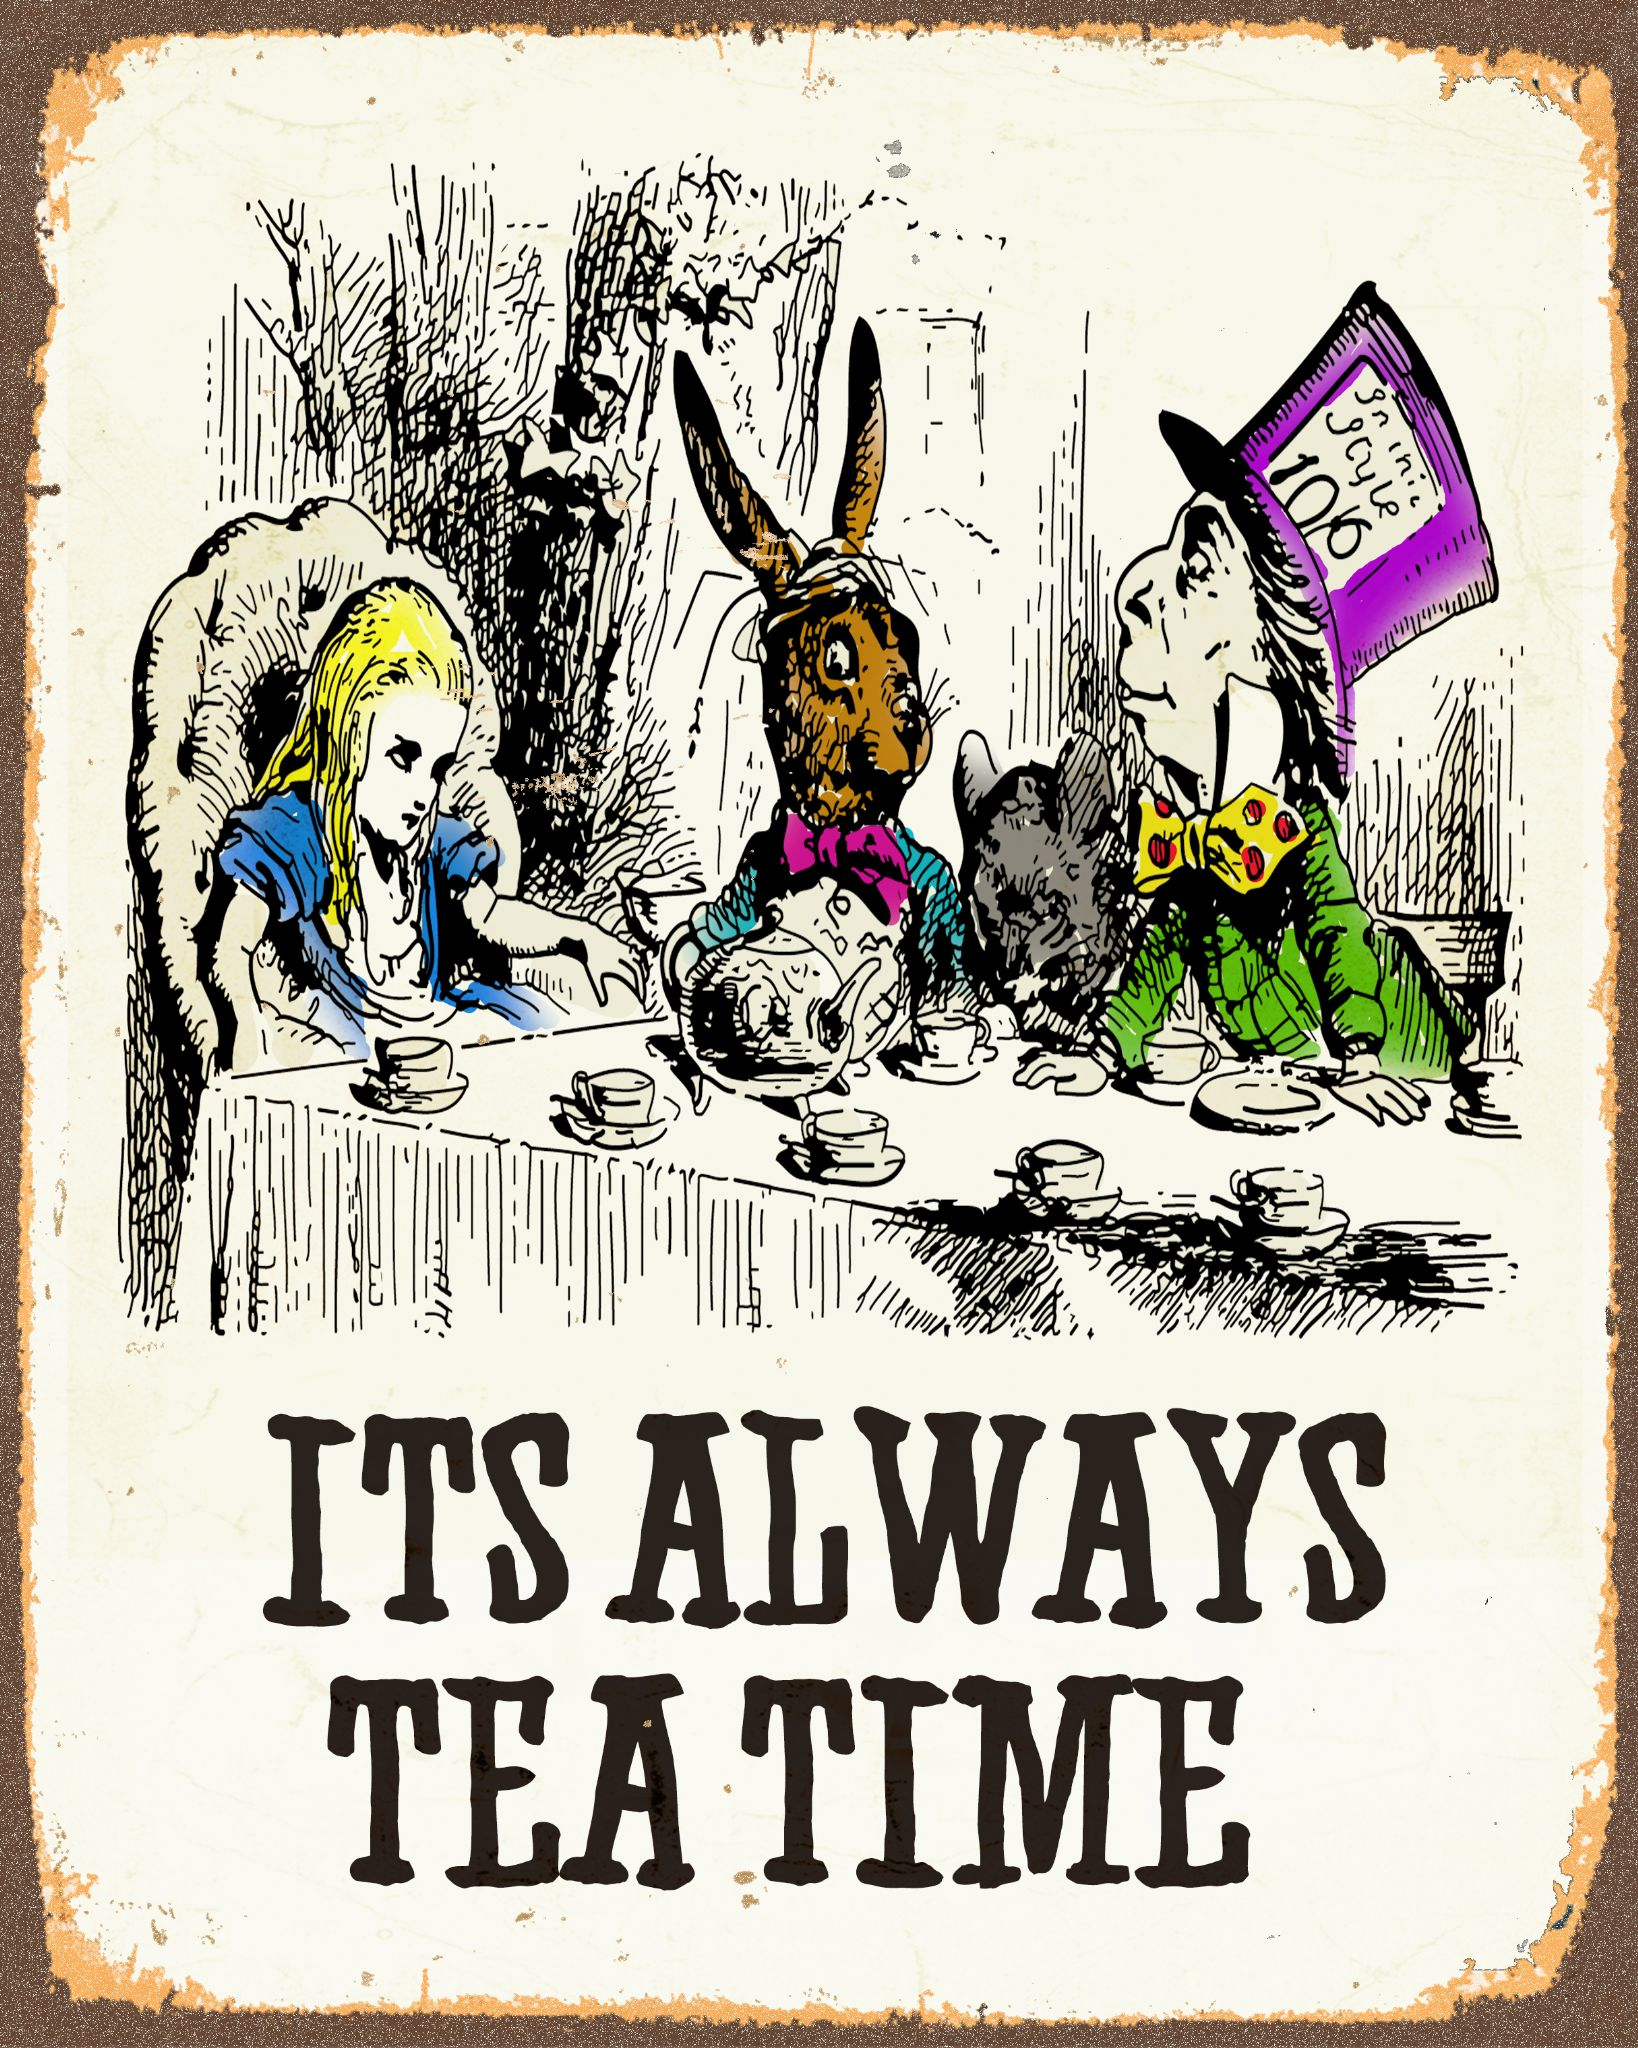 alice-in-wonderland-it-s-always-tea-time-metal-advertising-wall-sign-retro-art-3052-p